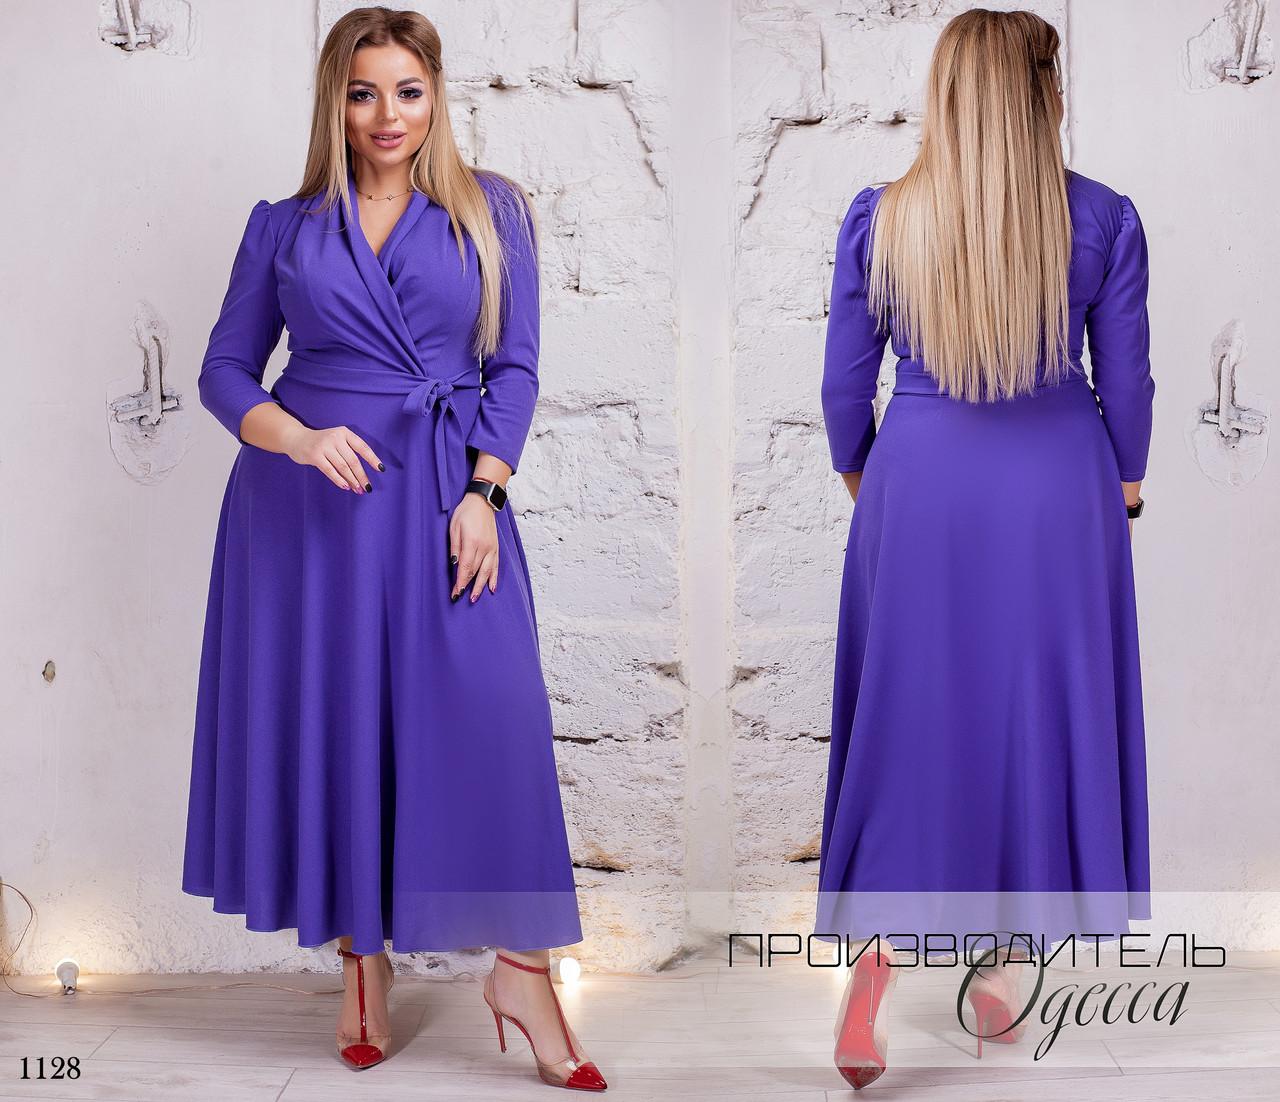 Платье вечернее миди имитация на запах креп-дайвинг 48-50,52-54